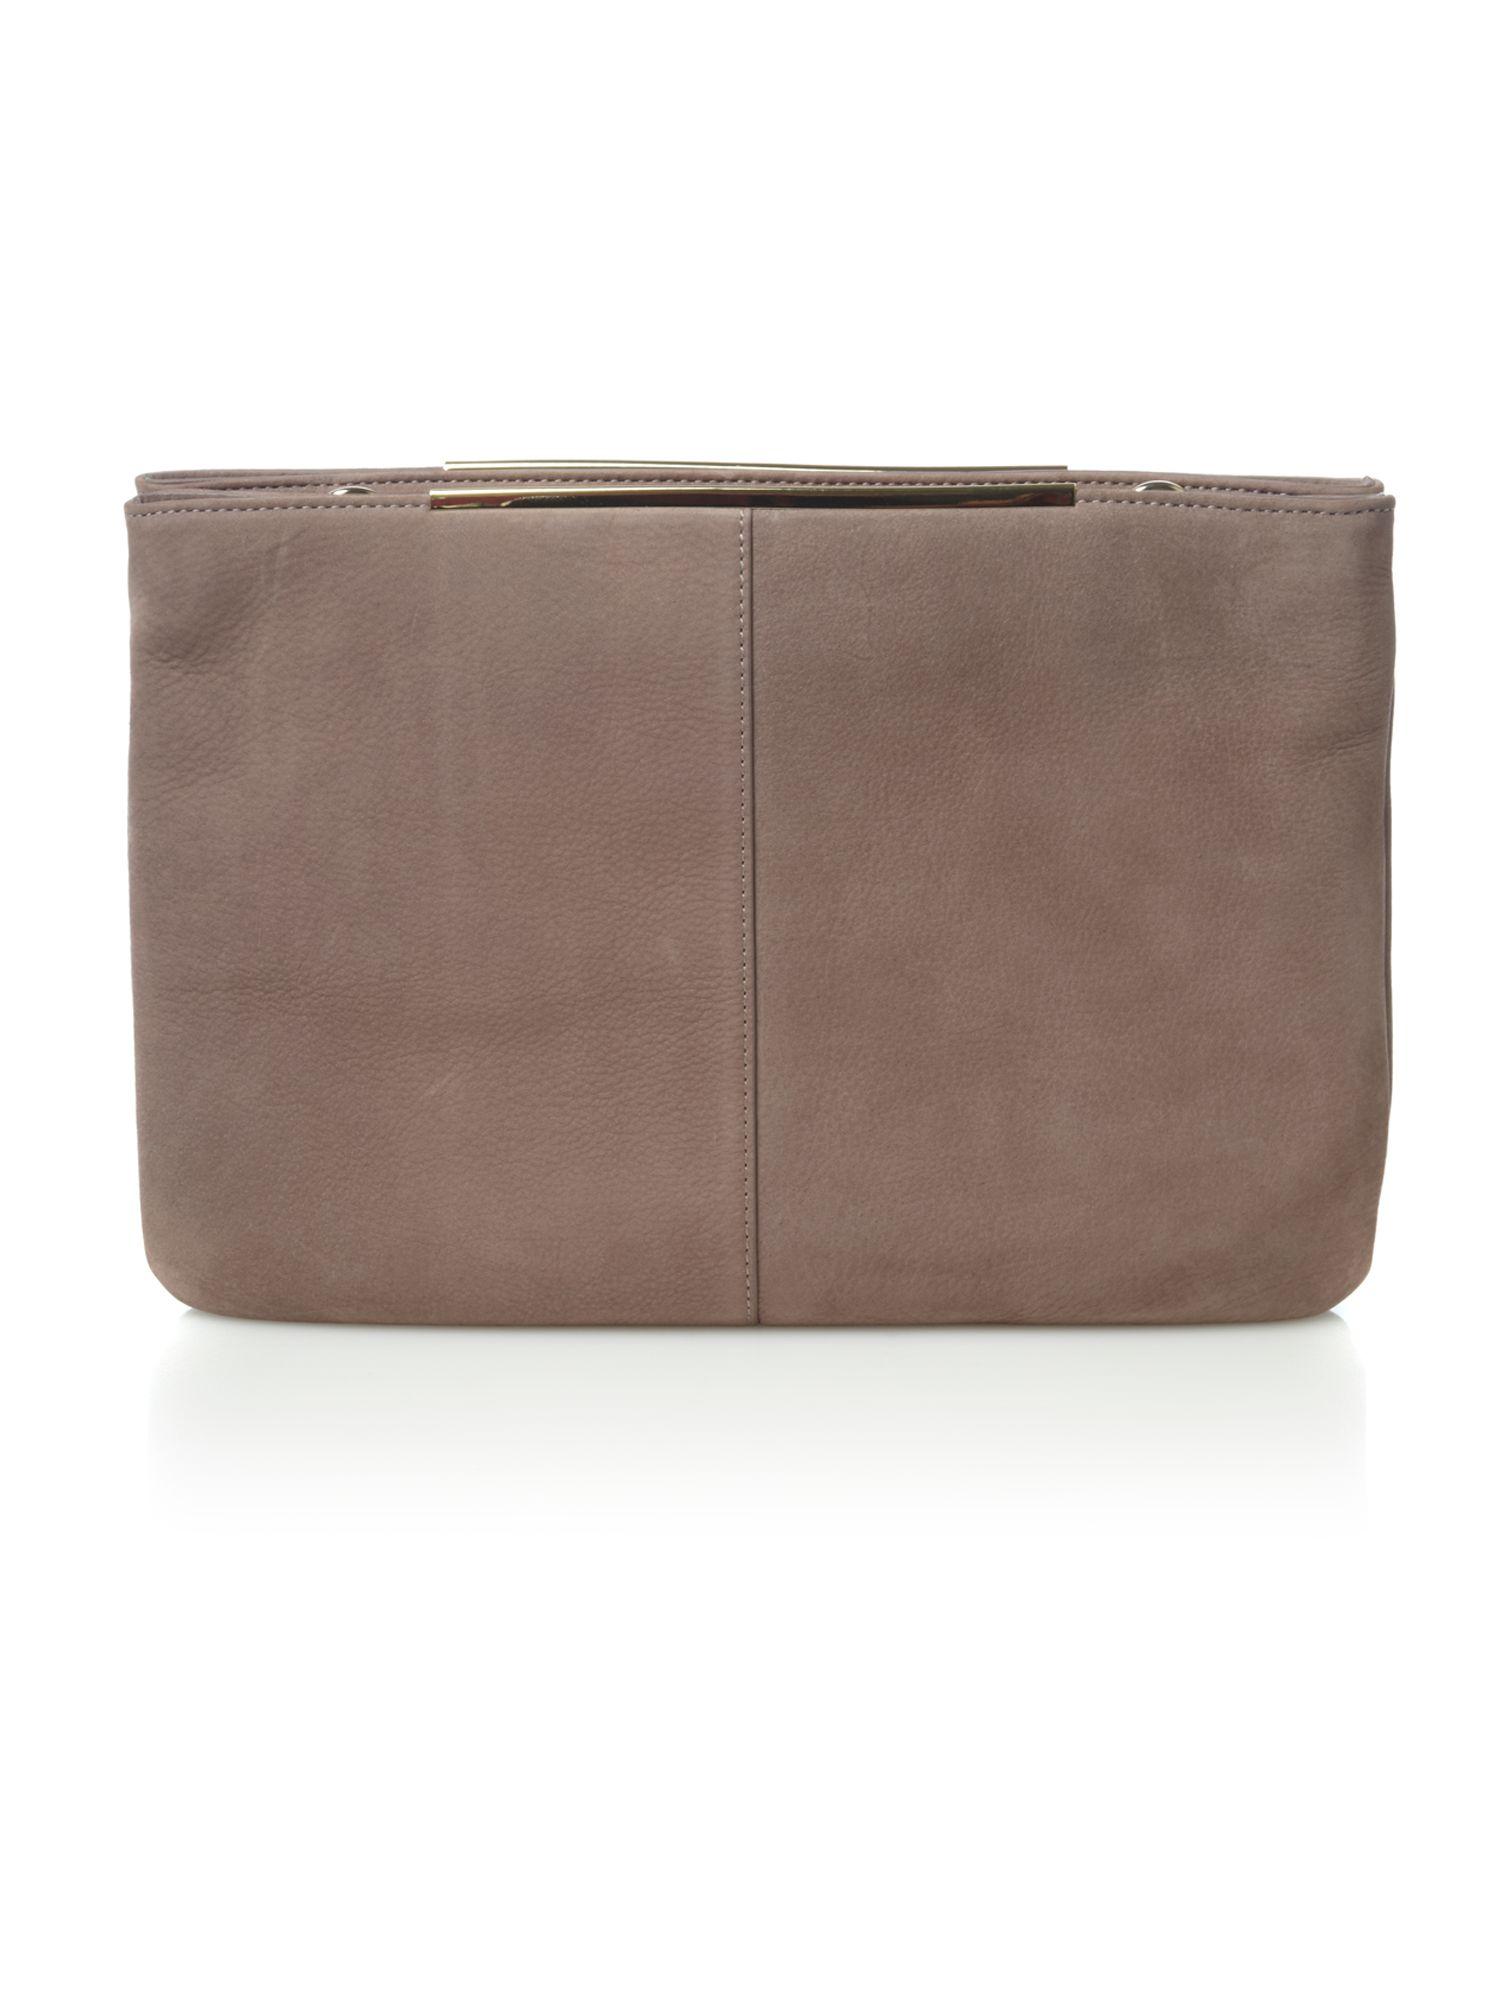 Mary Portas Double Zip Feature Cross Body Bag in Grey (Grey)